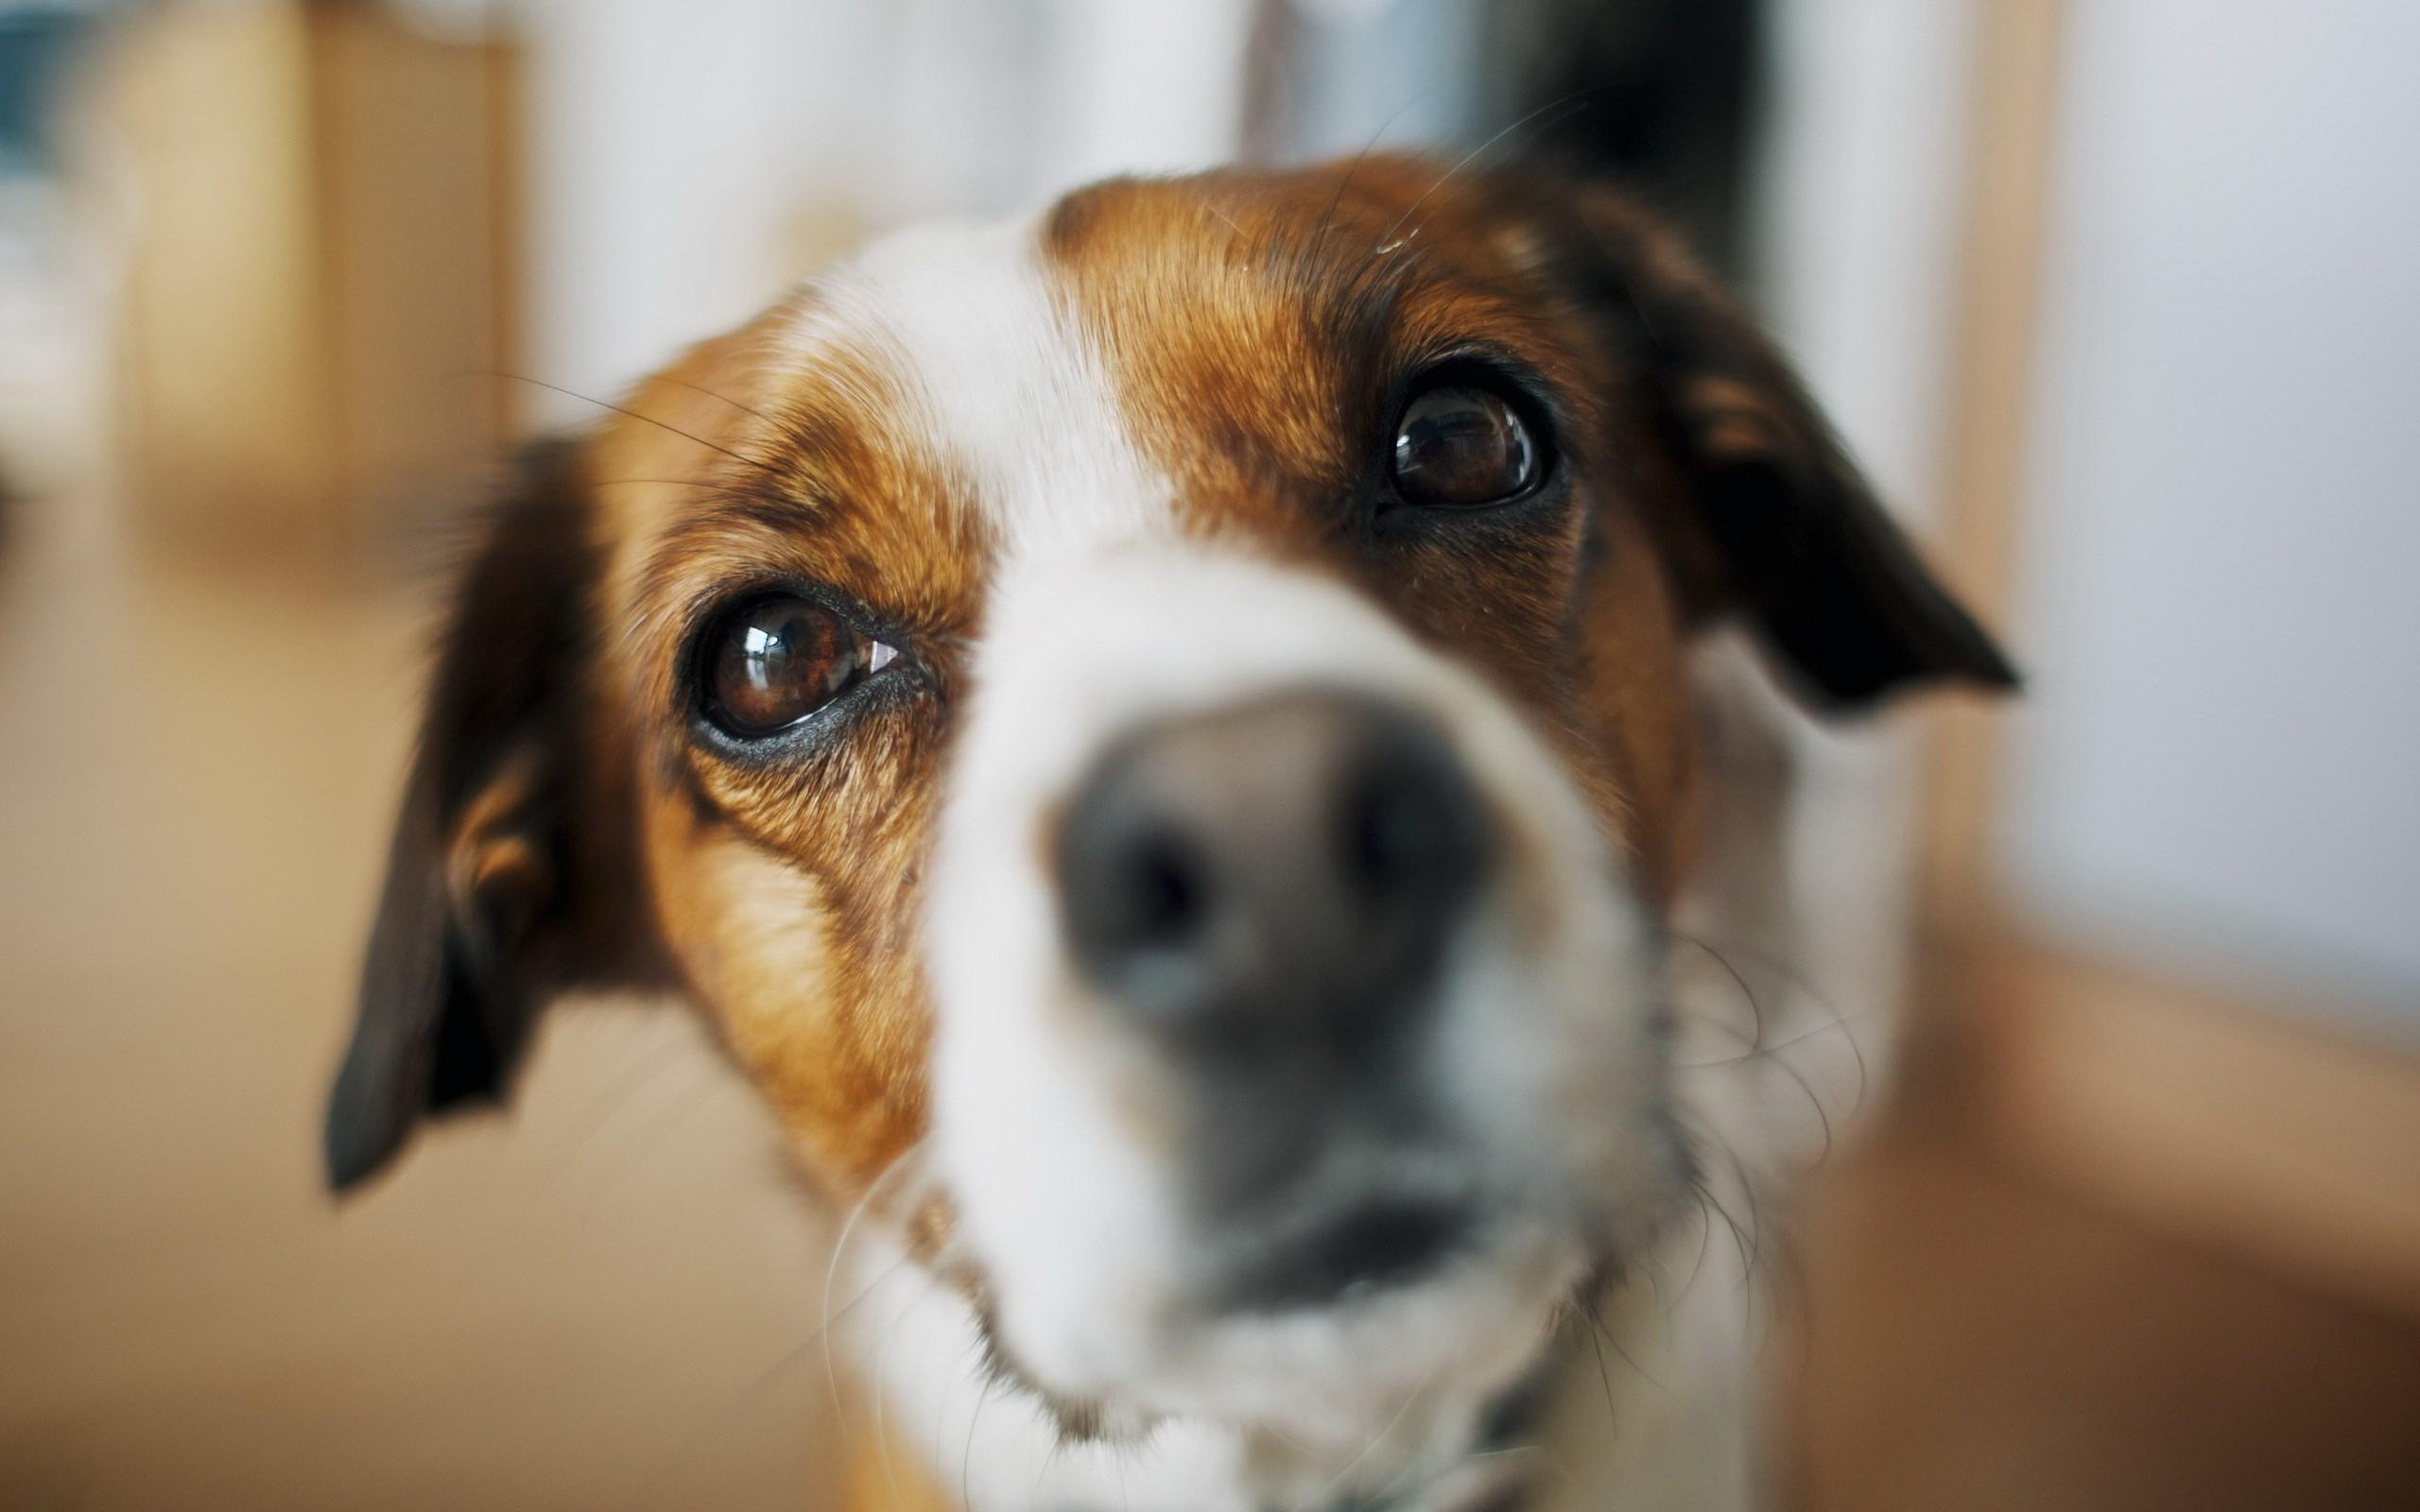 Dog Look Blur Photo HD Wallpaper